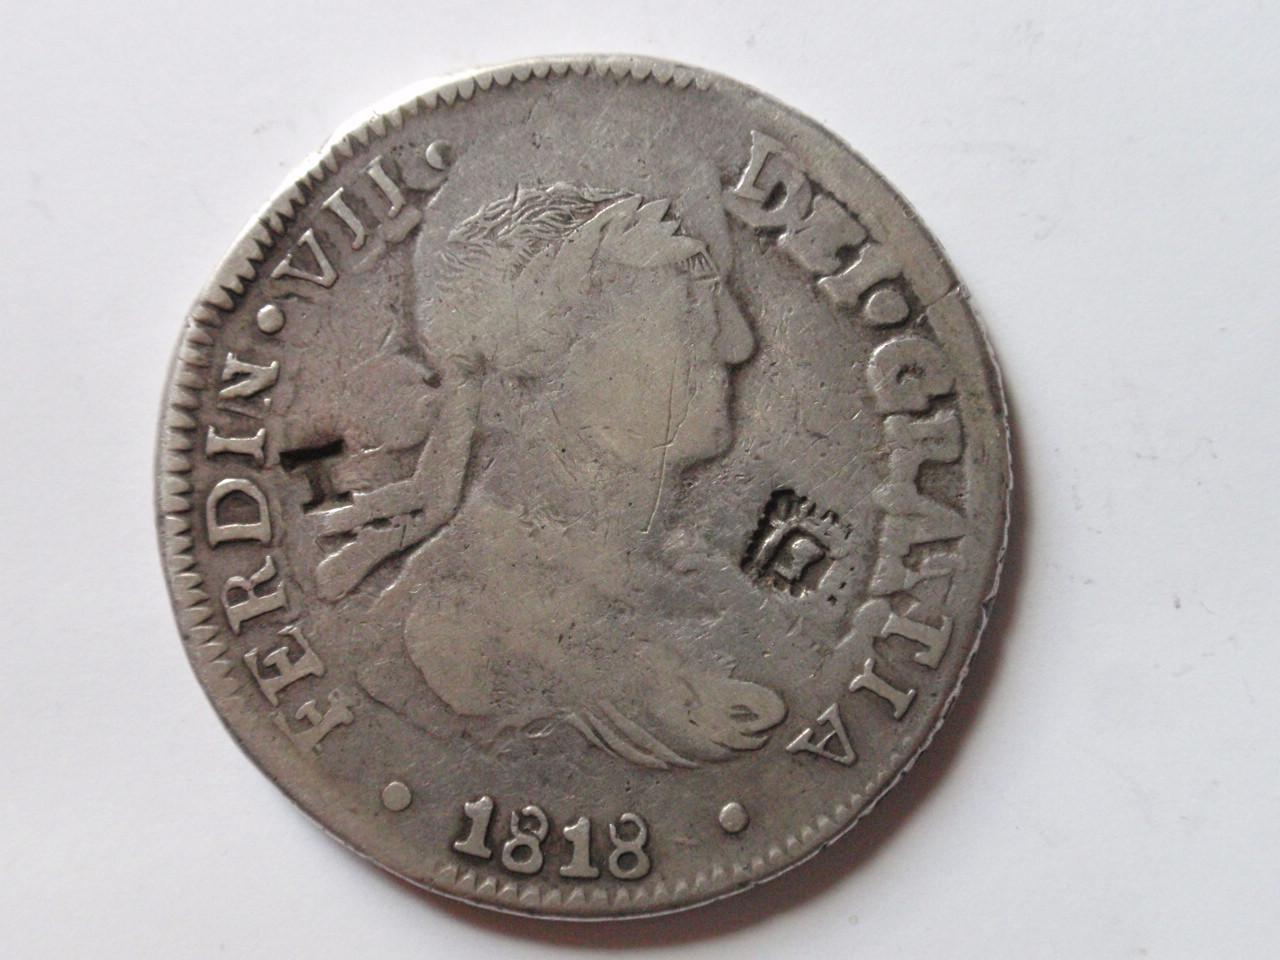 8 Reales 1818 Fernando VII  Chiguagua (Jotasoler dedit) 8_reales_031